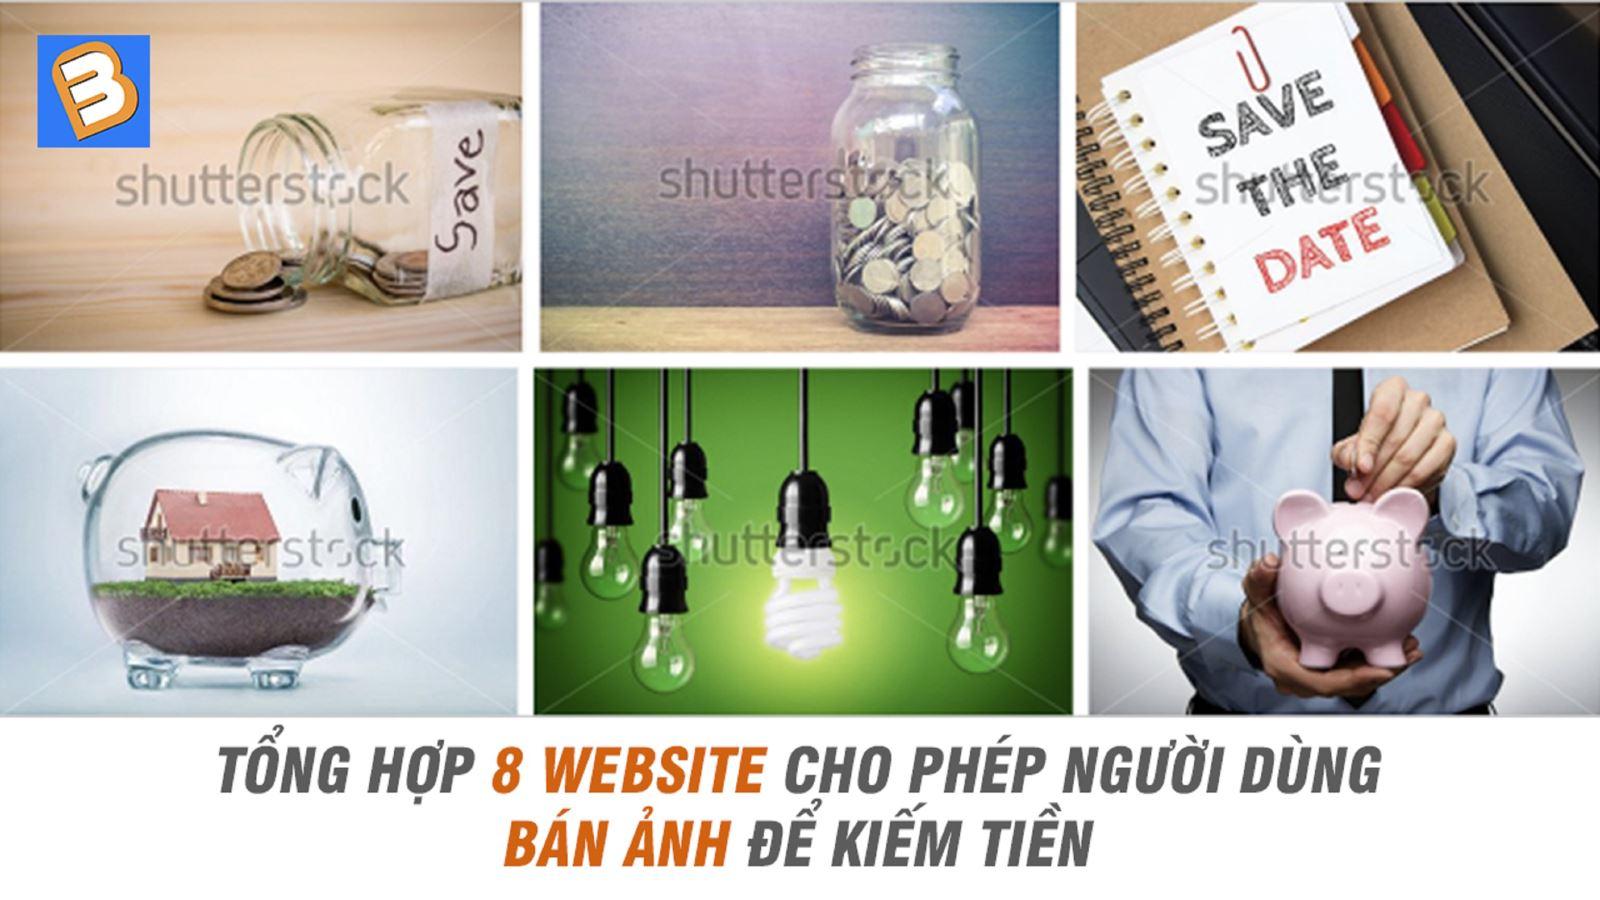 8 website cho phep nguoi dung ban anh de kiem tien Binhminhdigital 8 png